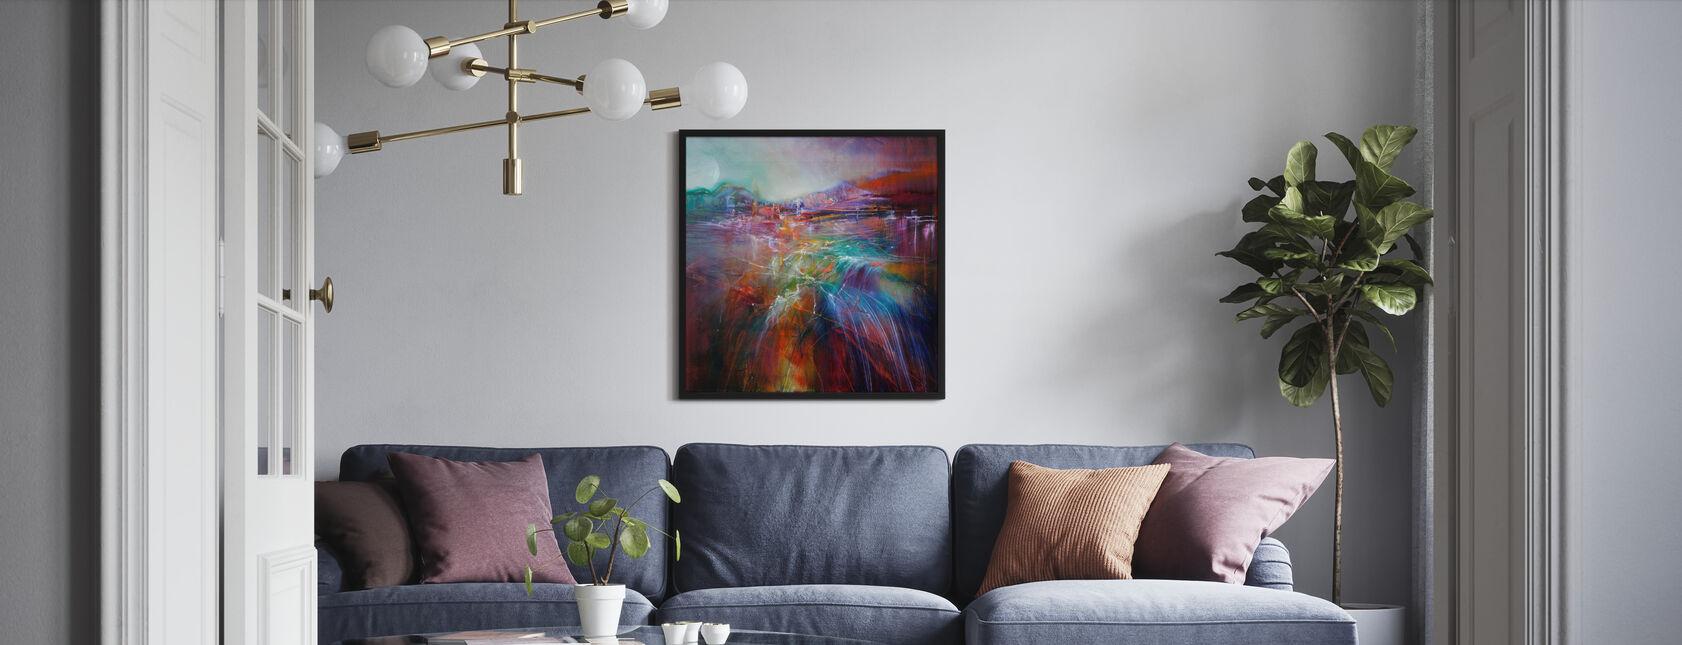 Evening Glow - Framed print - Living Room